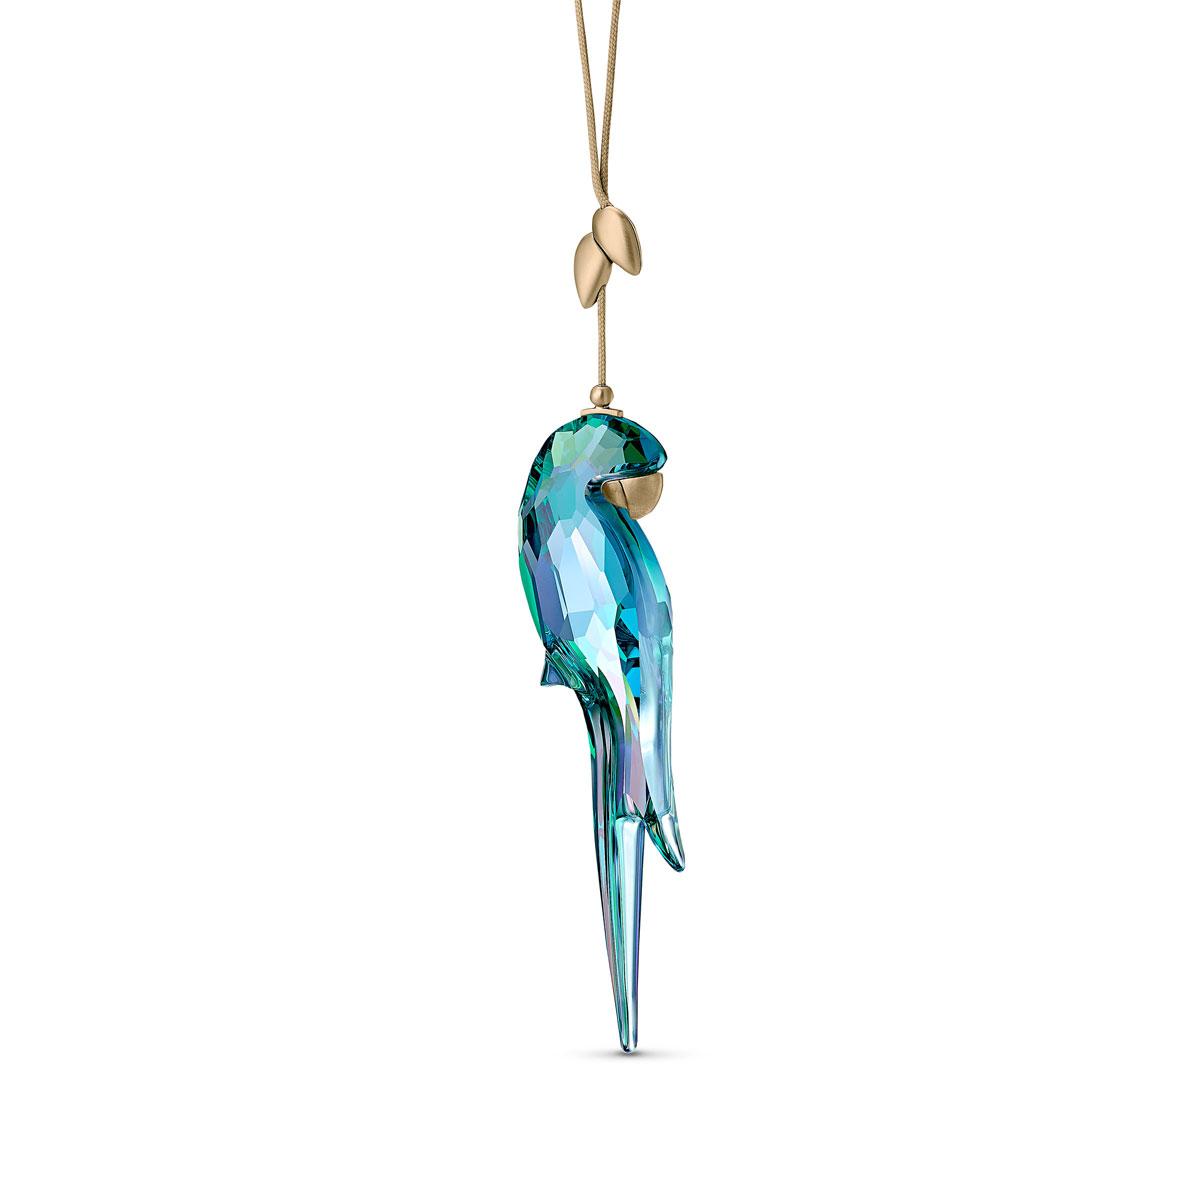 Swarovski Jungle Beats Parrot Ornament